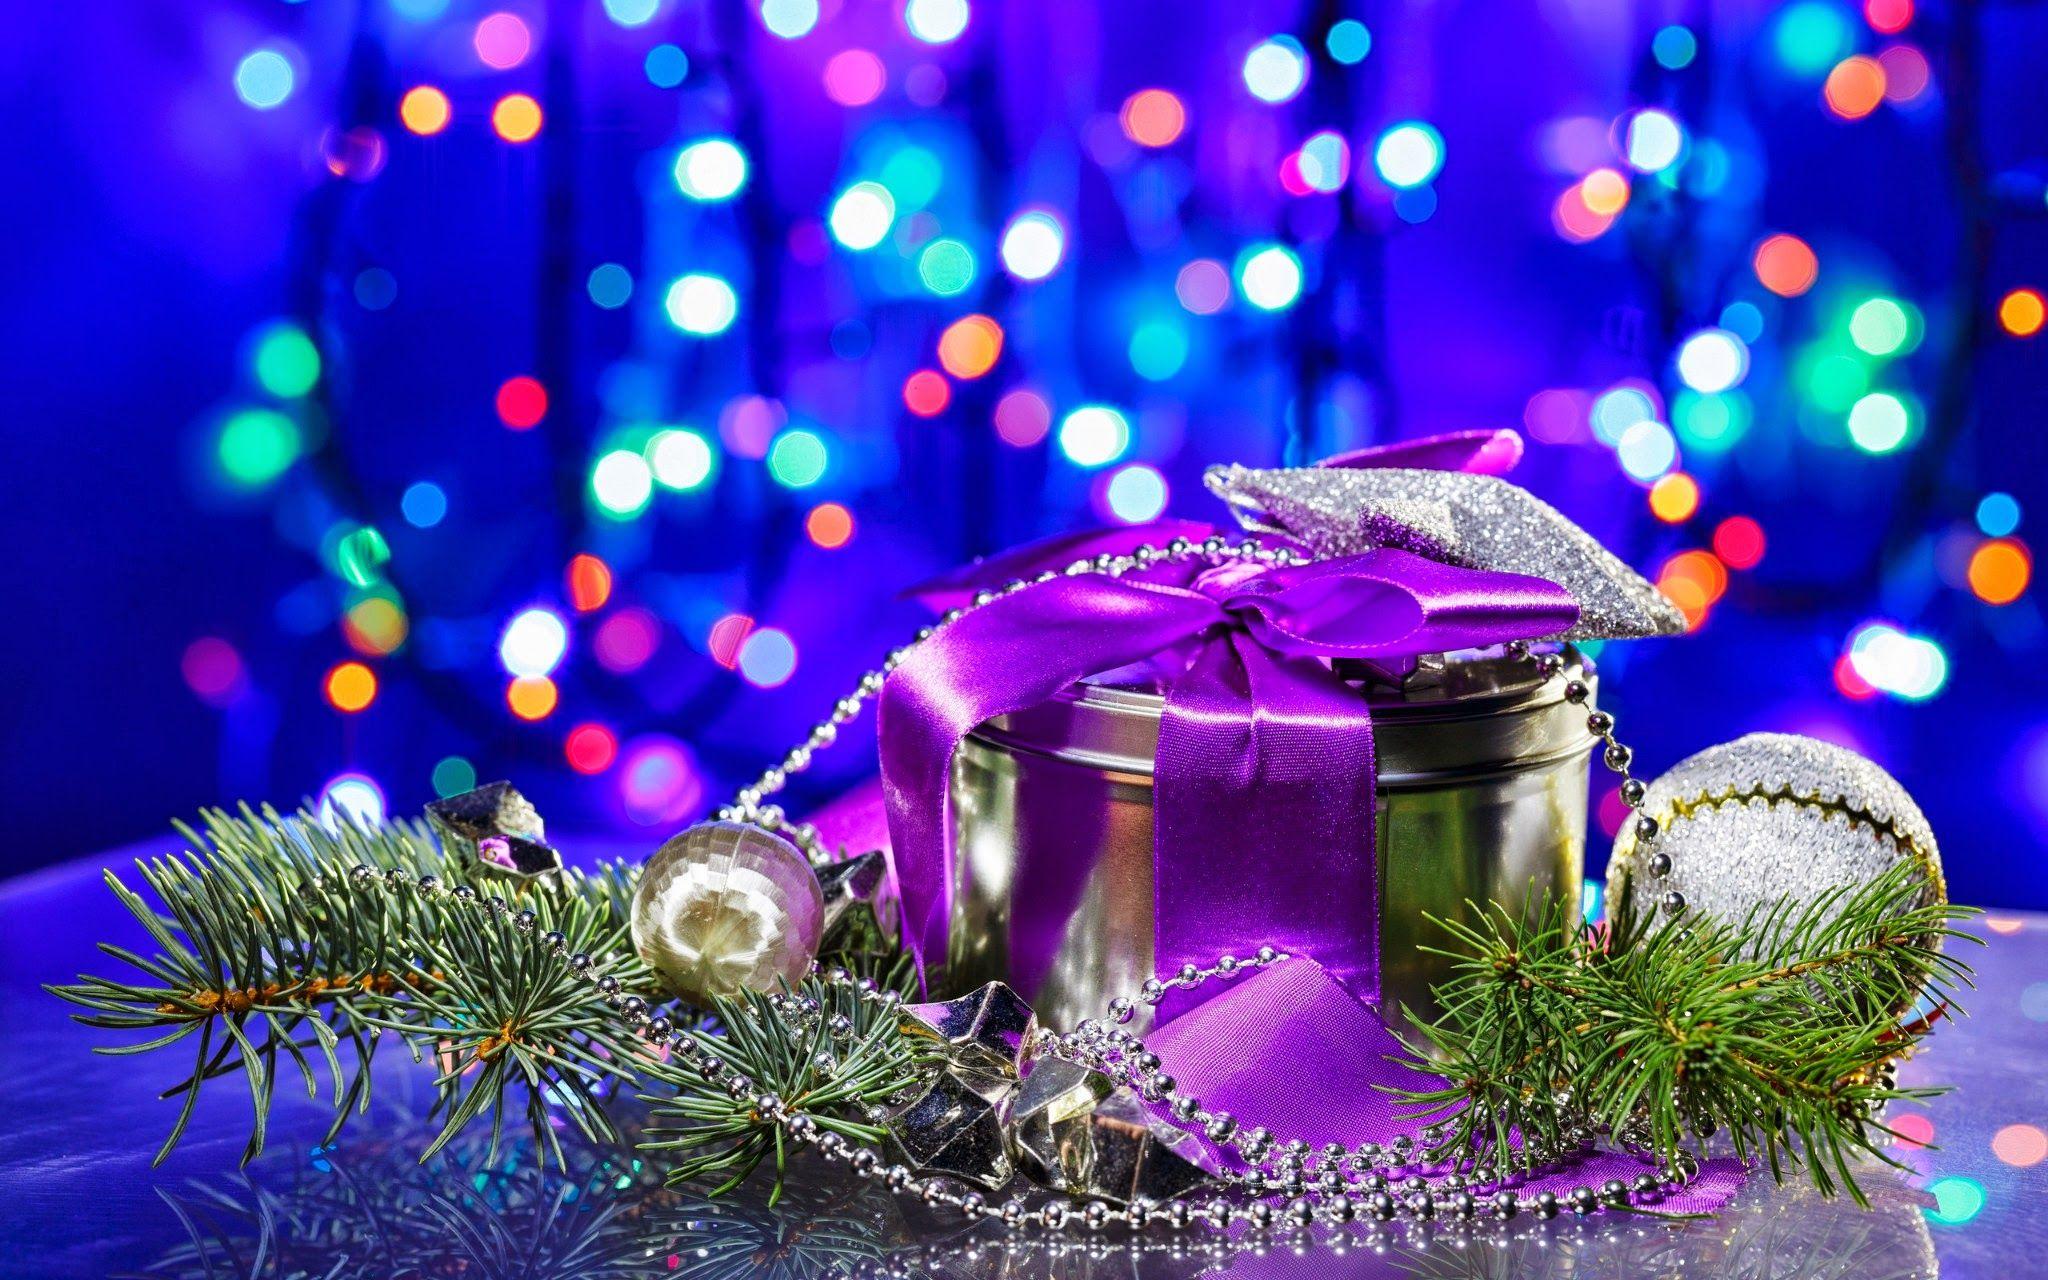 Gifts for new years hd desktop wallpaper widescreen - Purple christmas desktop wallpaper ...